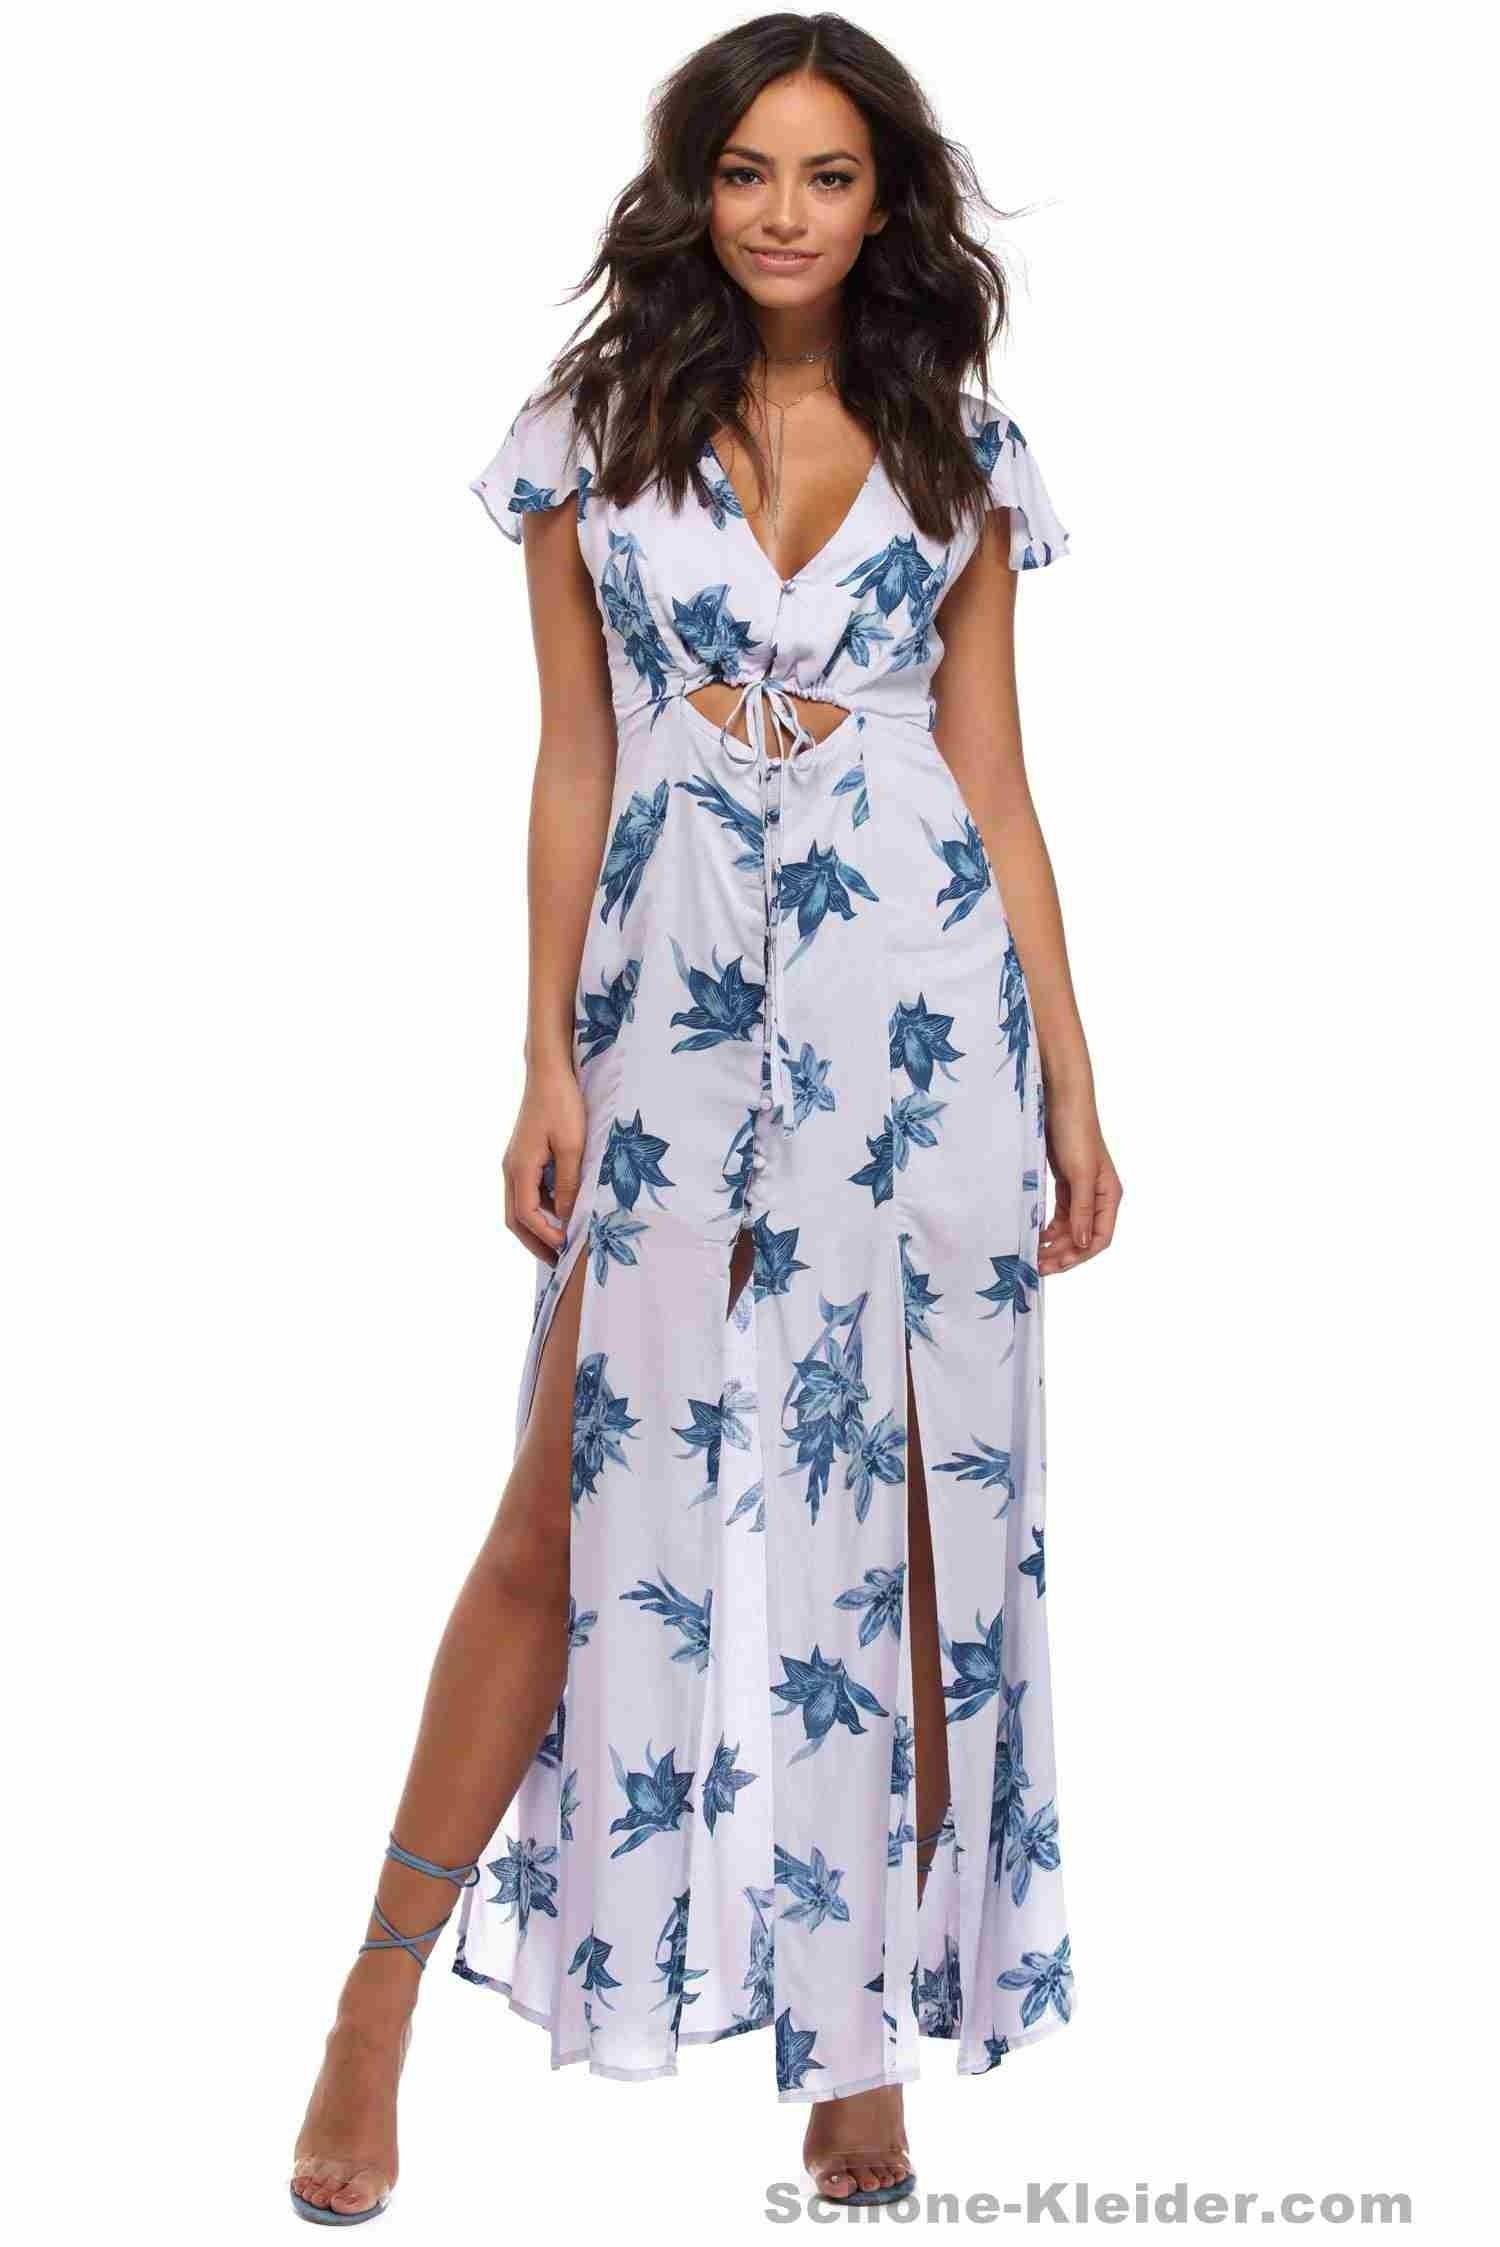 15 Elegant Lange Elegante Sommerkleider Vertrieb Top Lange Elegante Sommerkleider Boutique